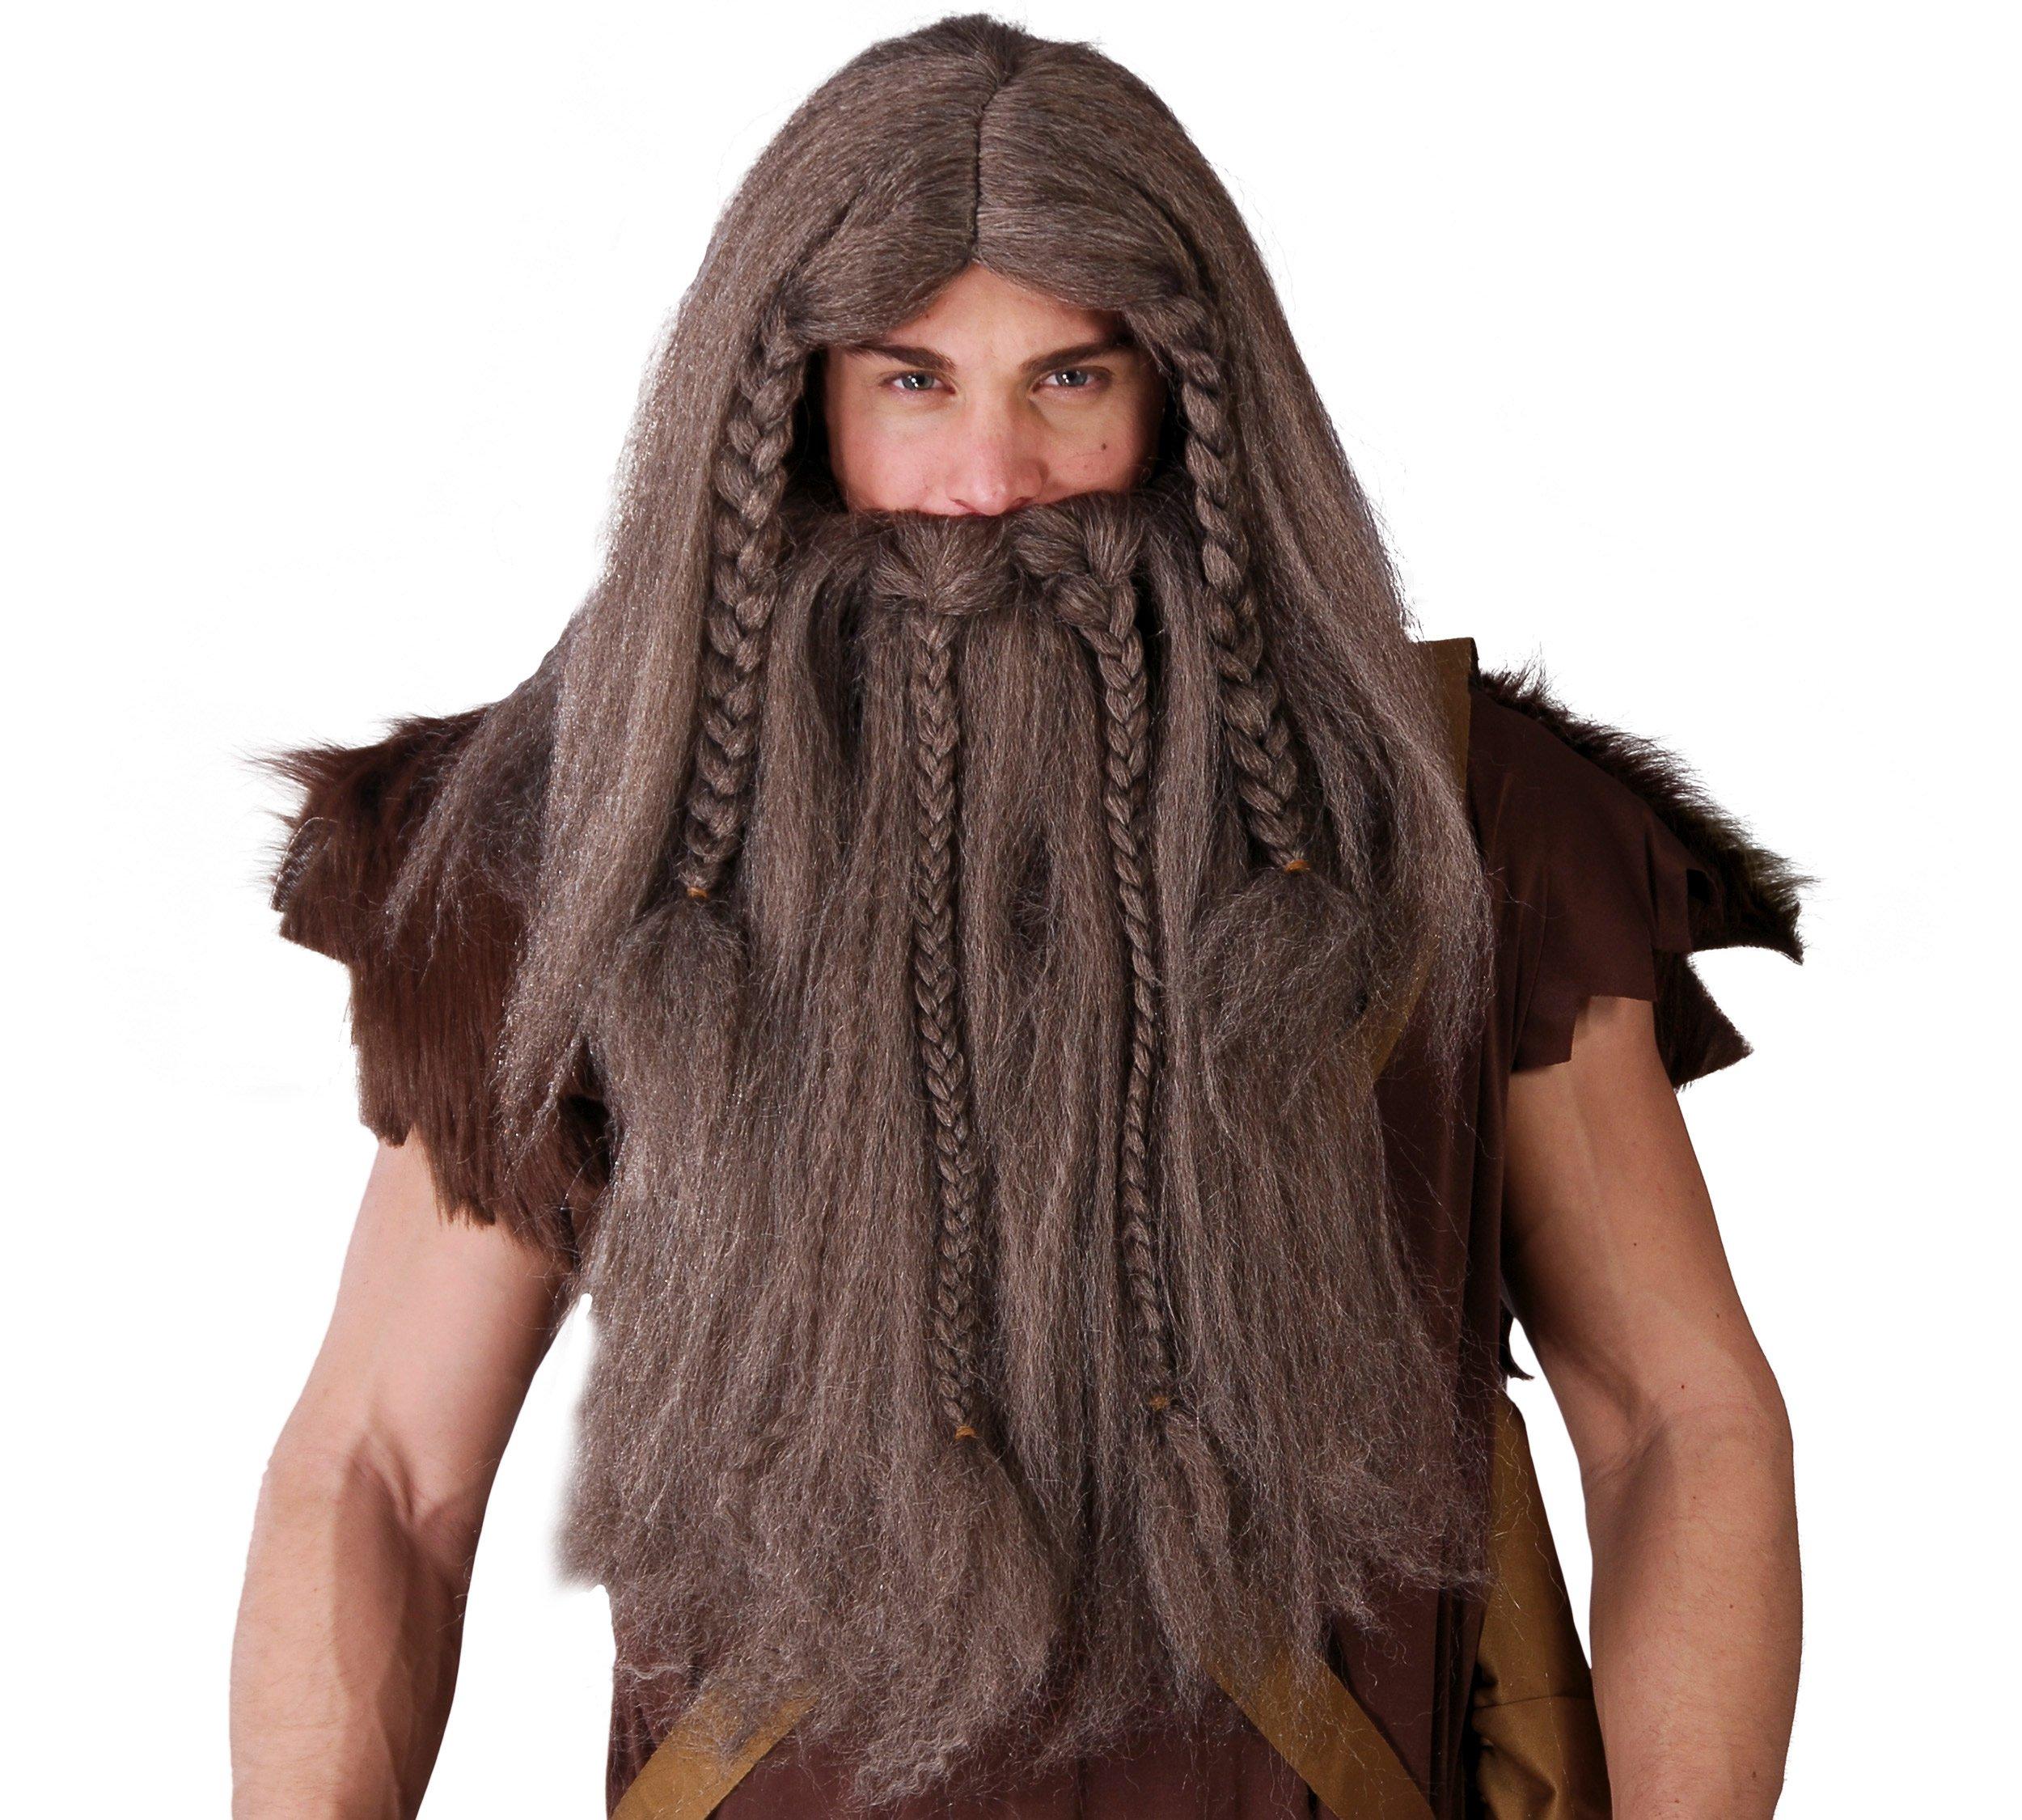 Guirca Fiestas GUI4809 Viking Wig and Beard